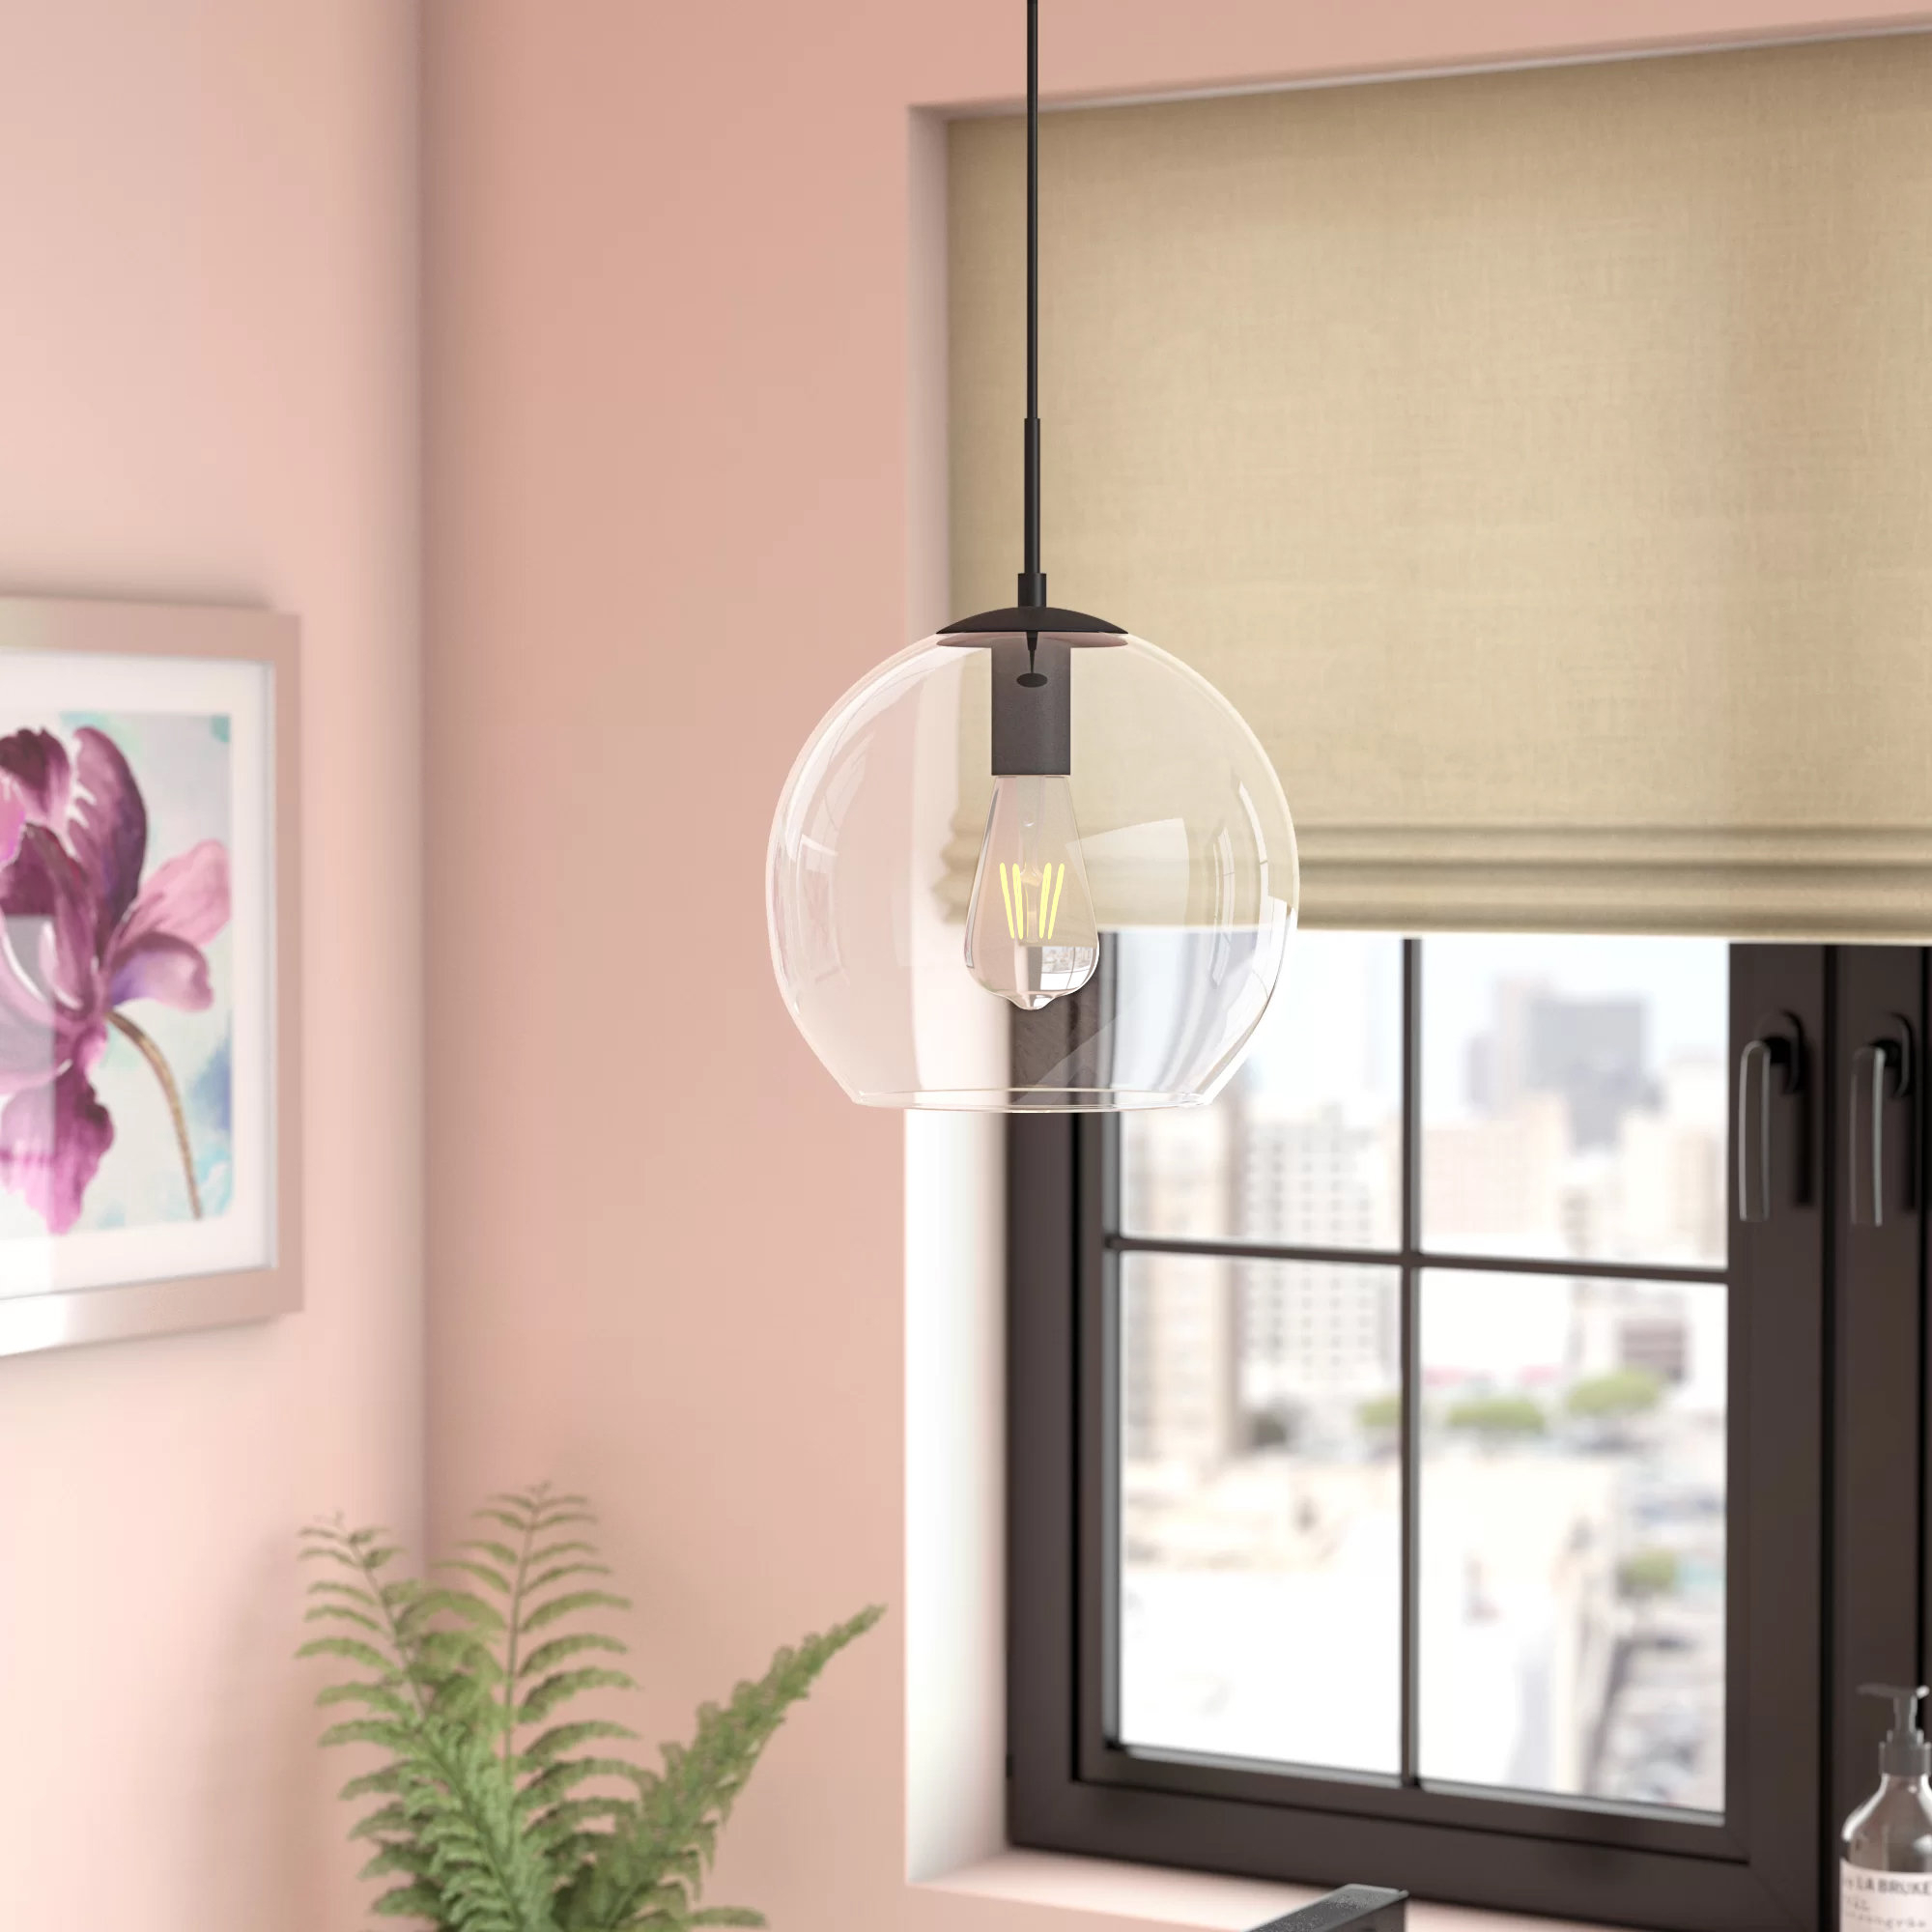 "Globe Mini (less Than 10"" Wide) Pendant Lighting You'll Love Intended For Devereaux 1 Light Single Globe Pendants (View 17 of 30)"